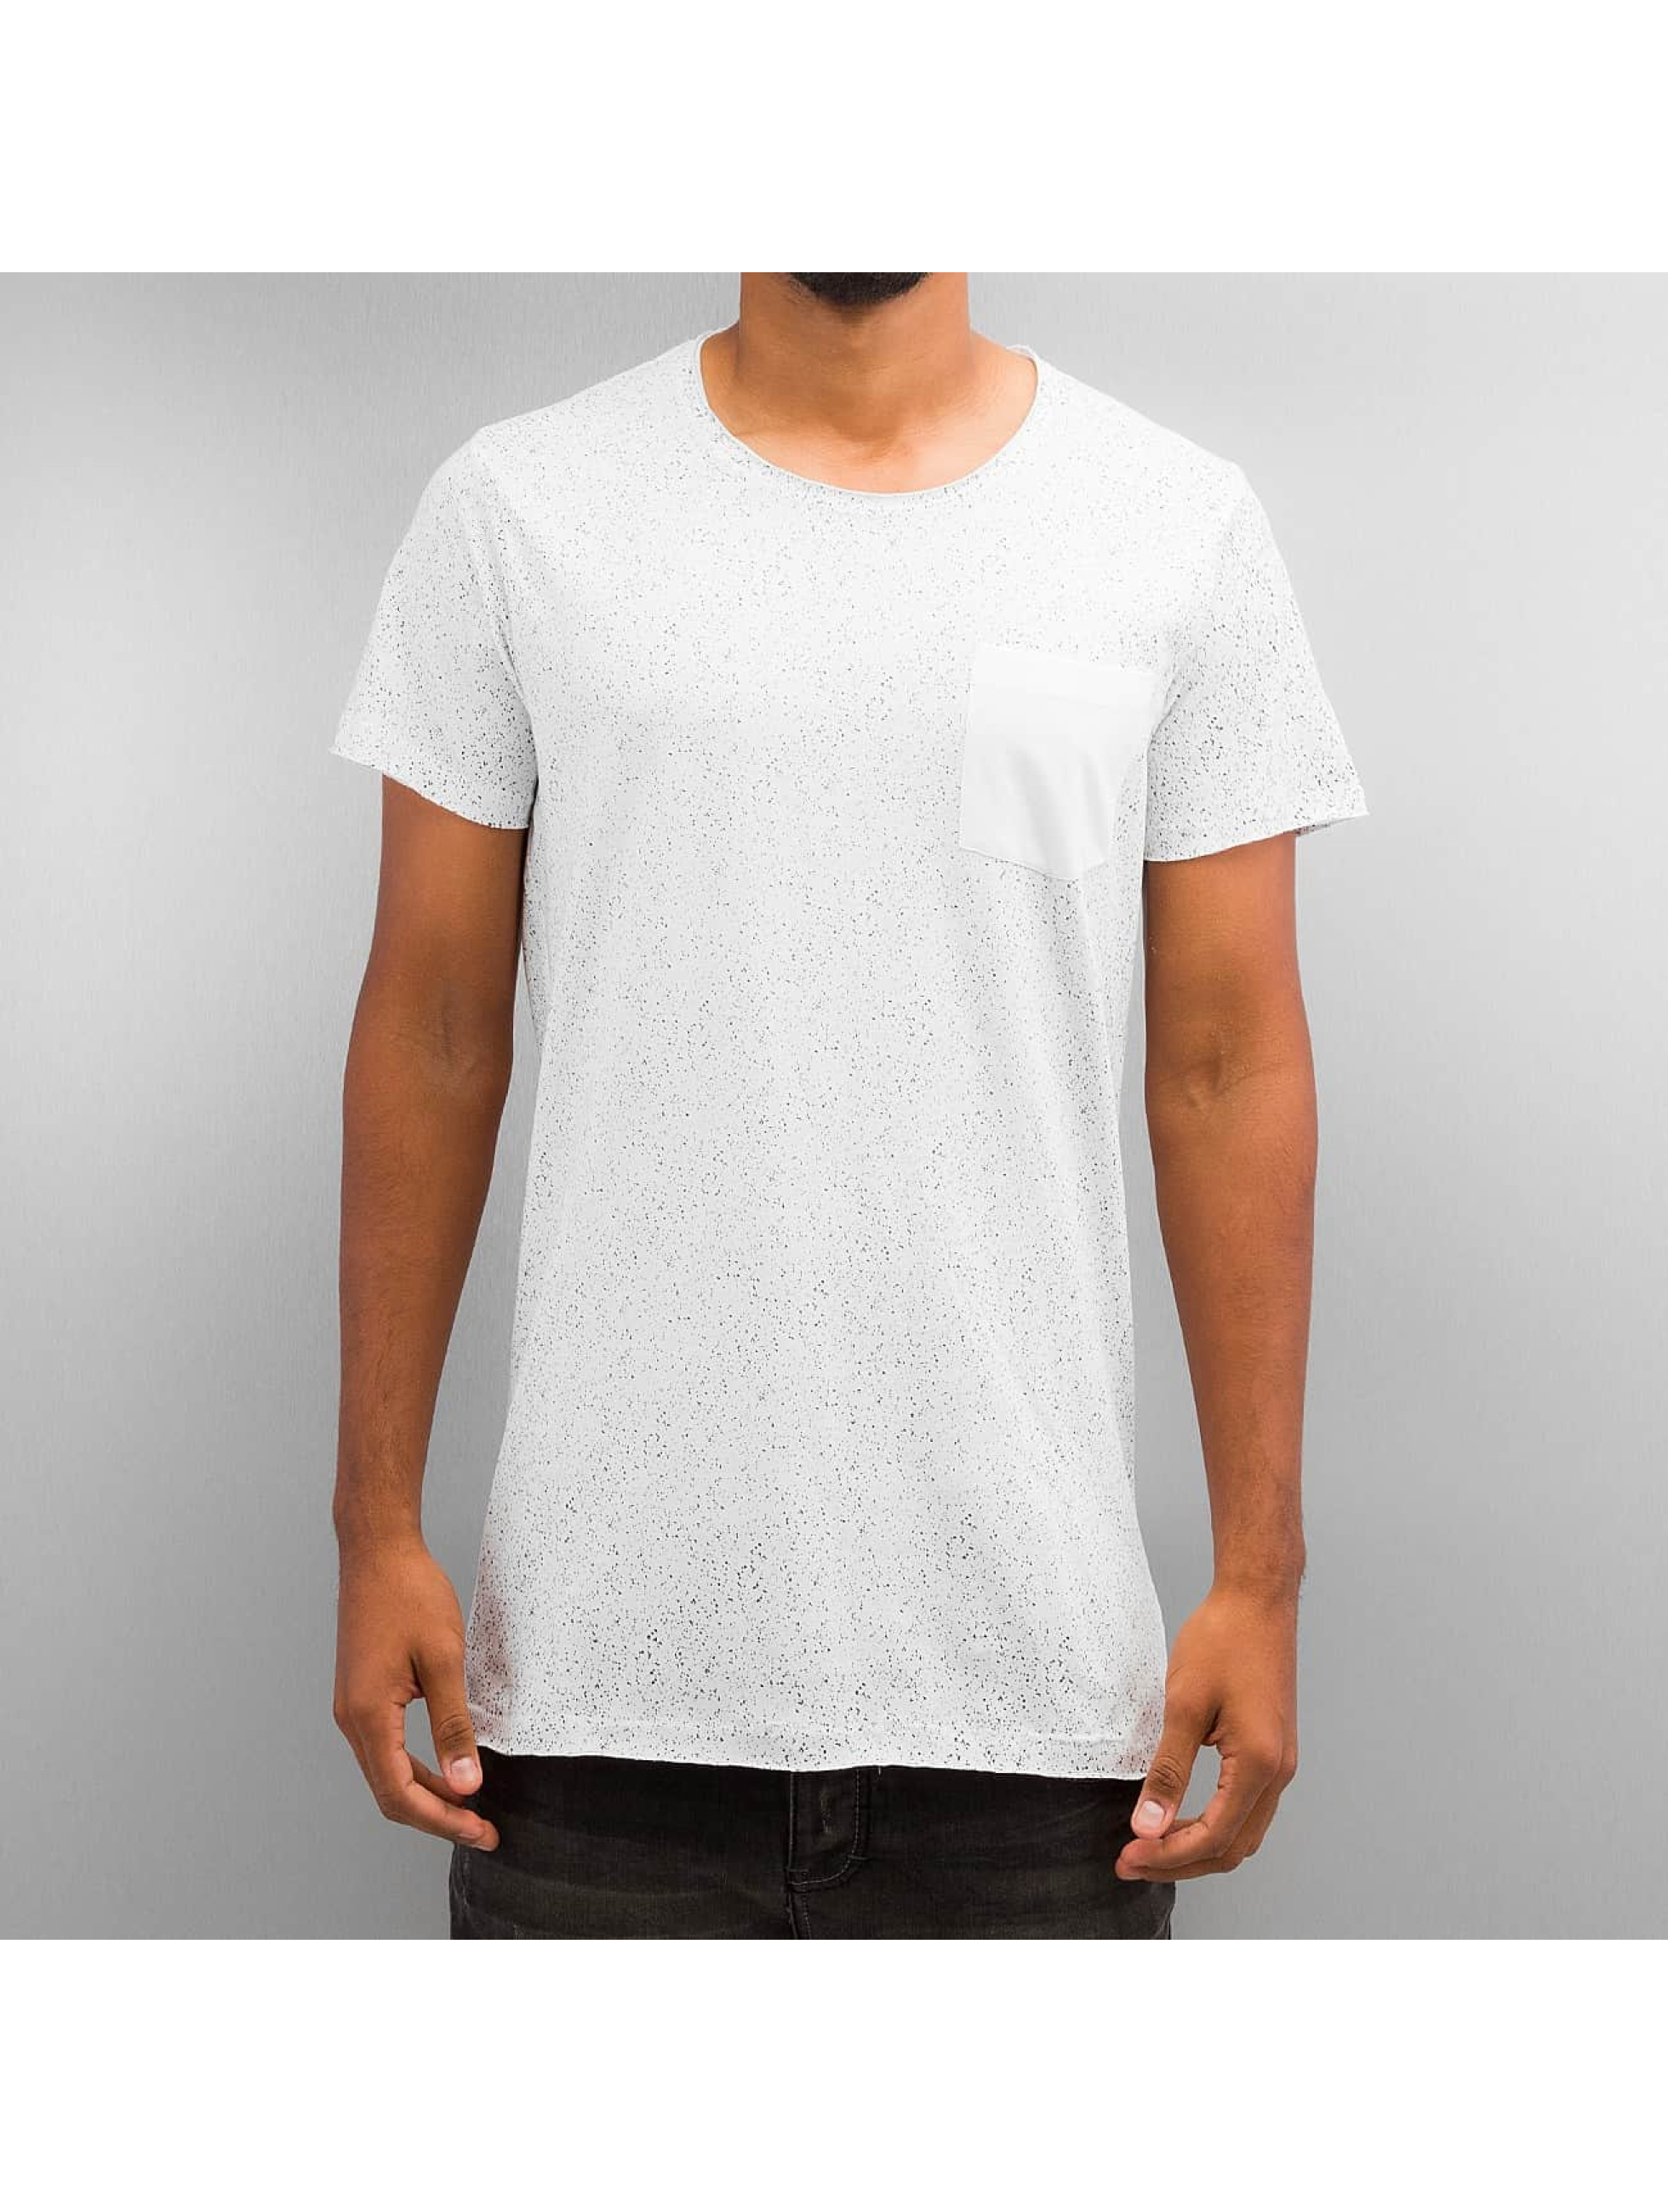 SHINE Original T-shirt All Over vit